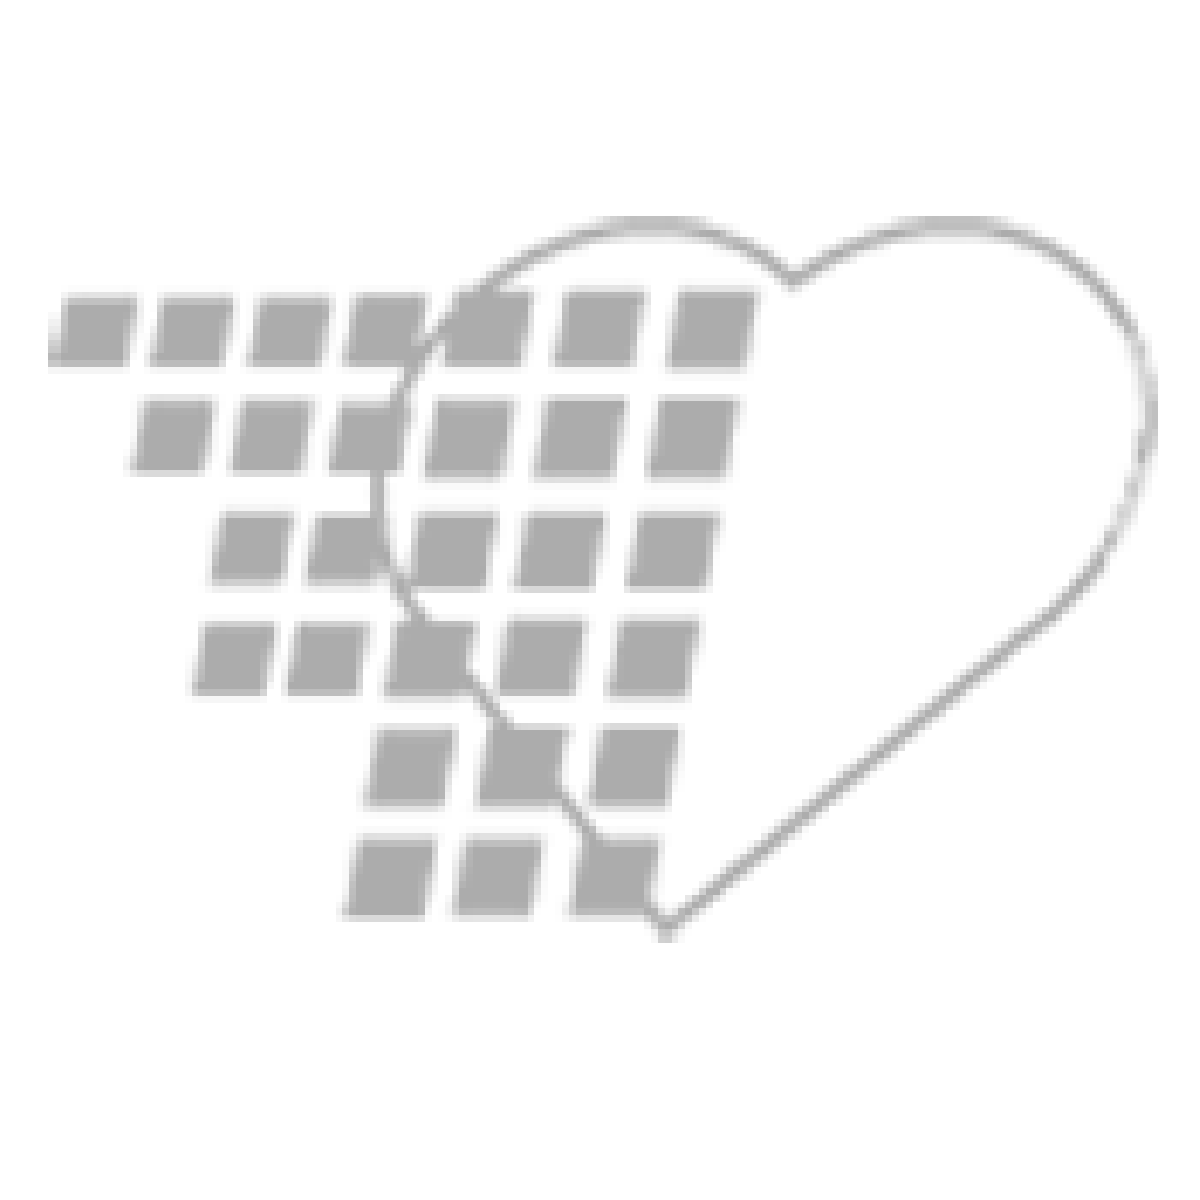 06-93-0423 Demo Dose® 5% Amino IV Fluid 1000 mL